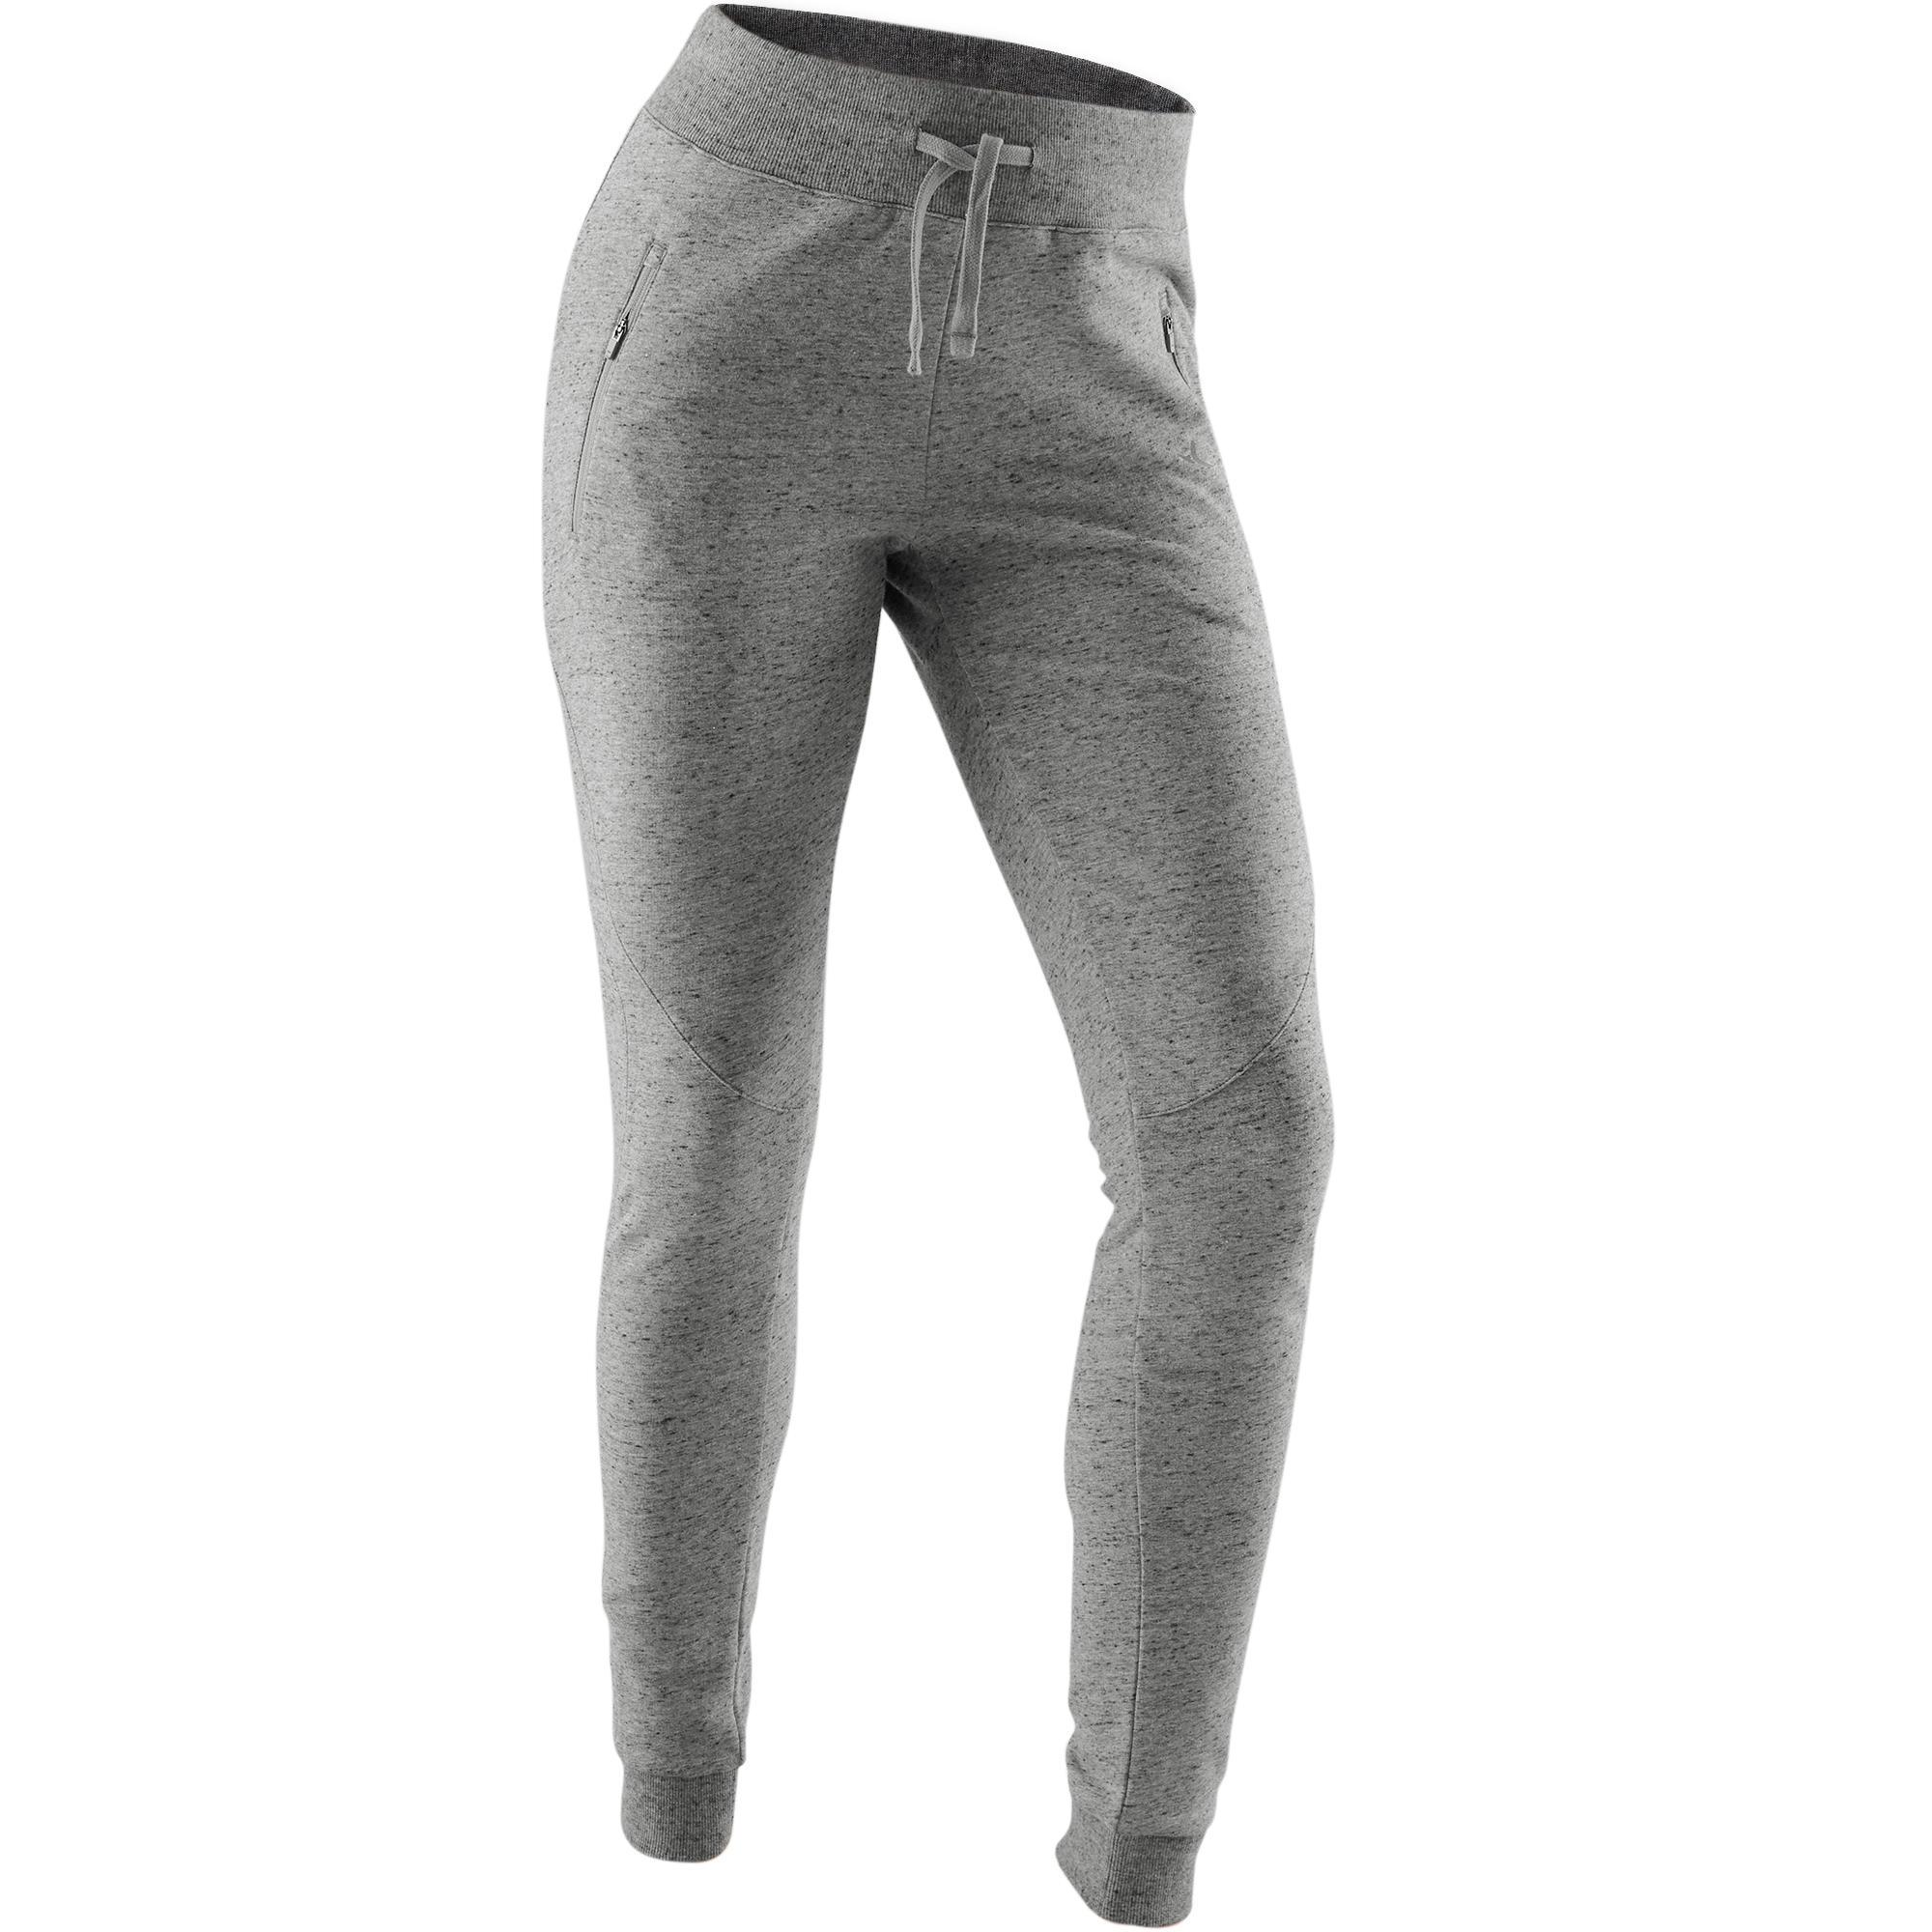 Pantalon 510 slim pilates gym douce femme gris domyos